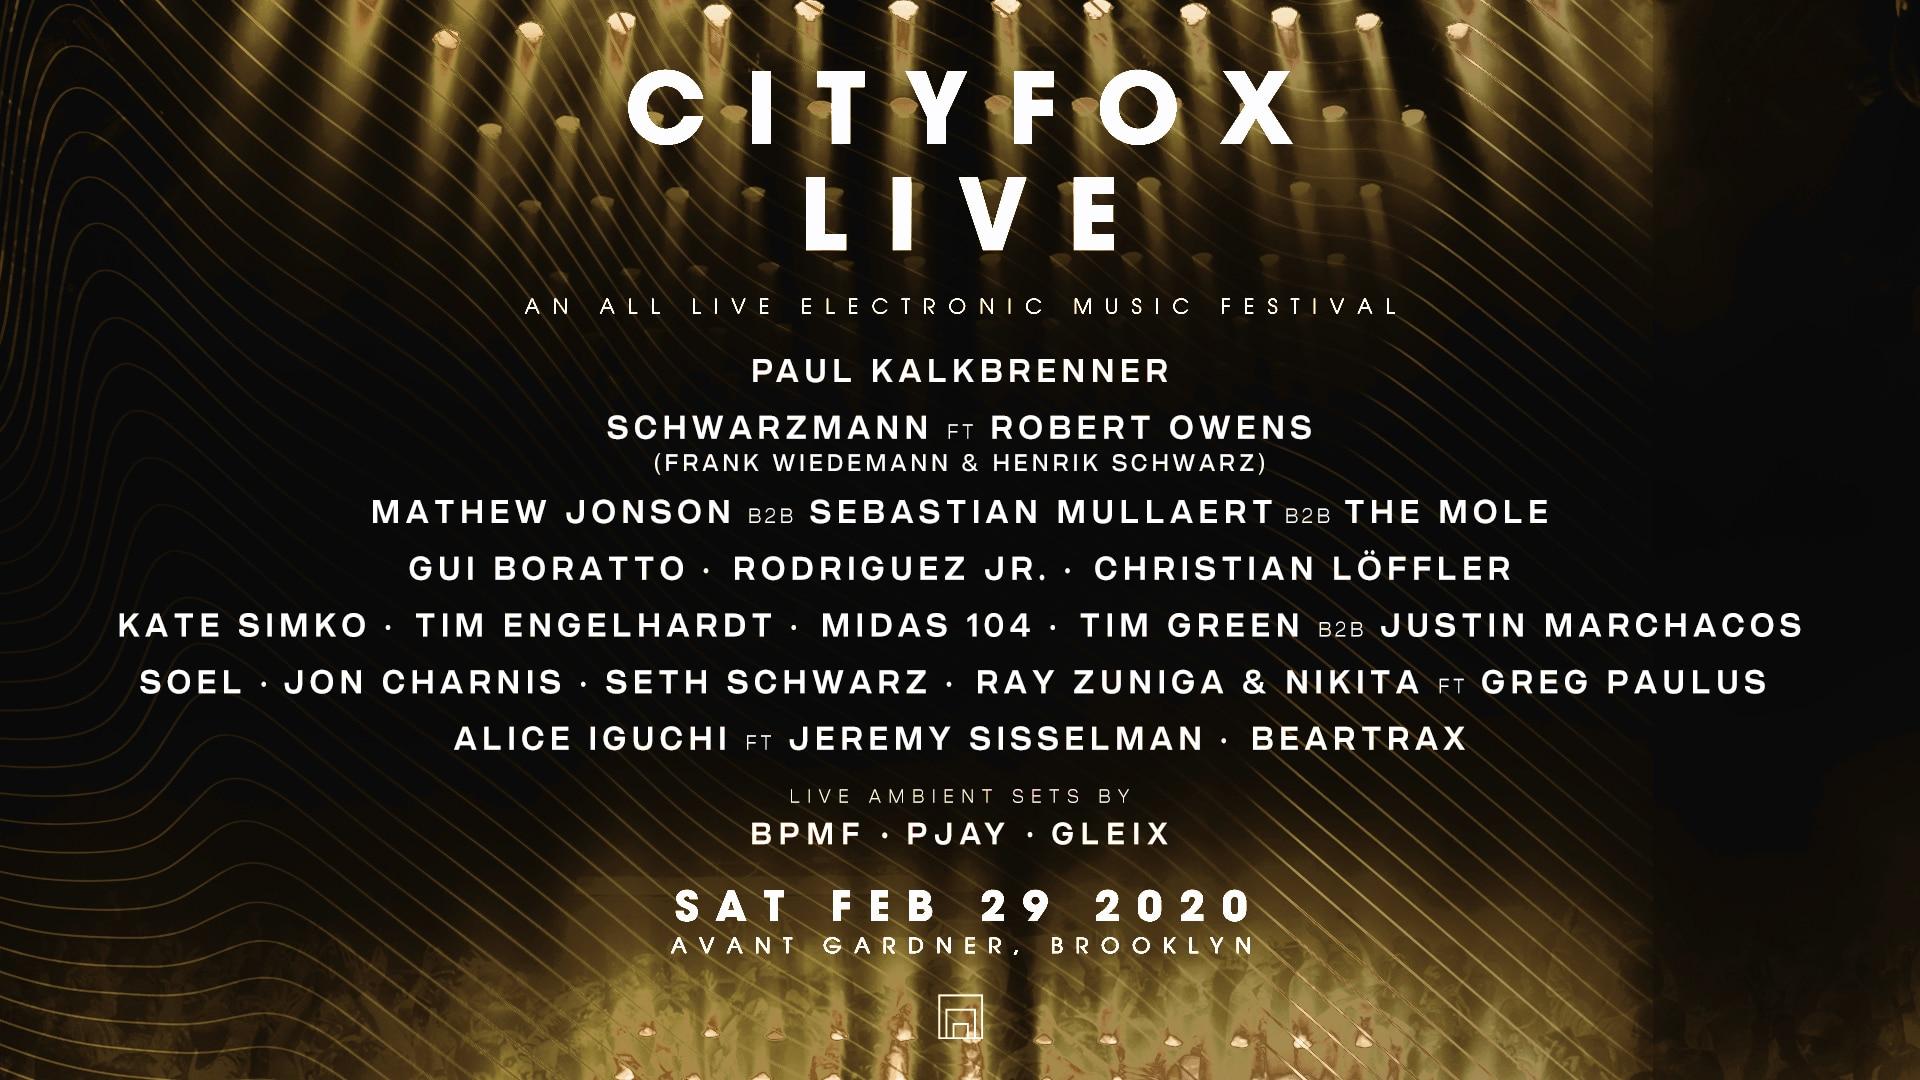 Cityfox LIVE 2020